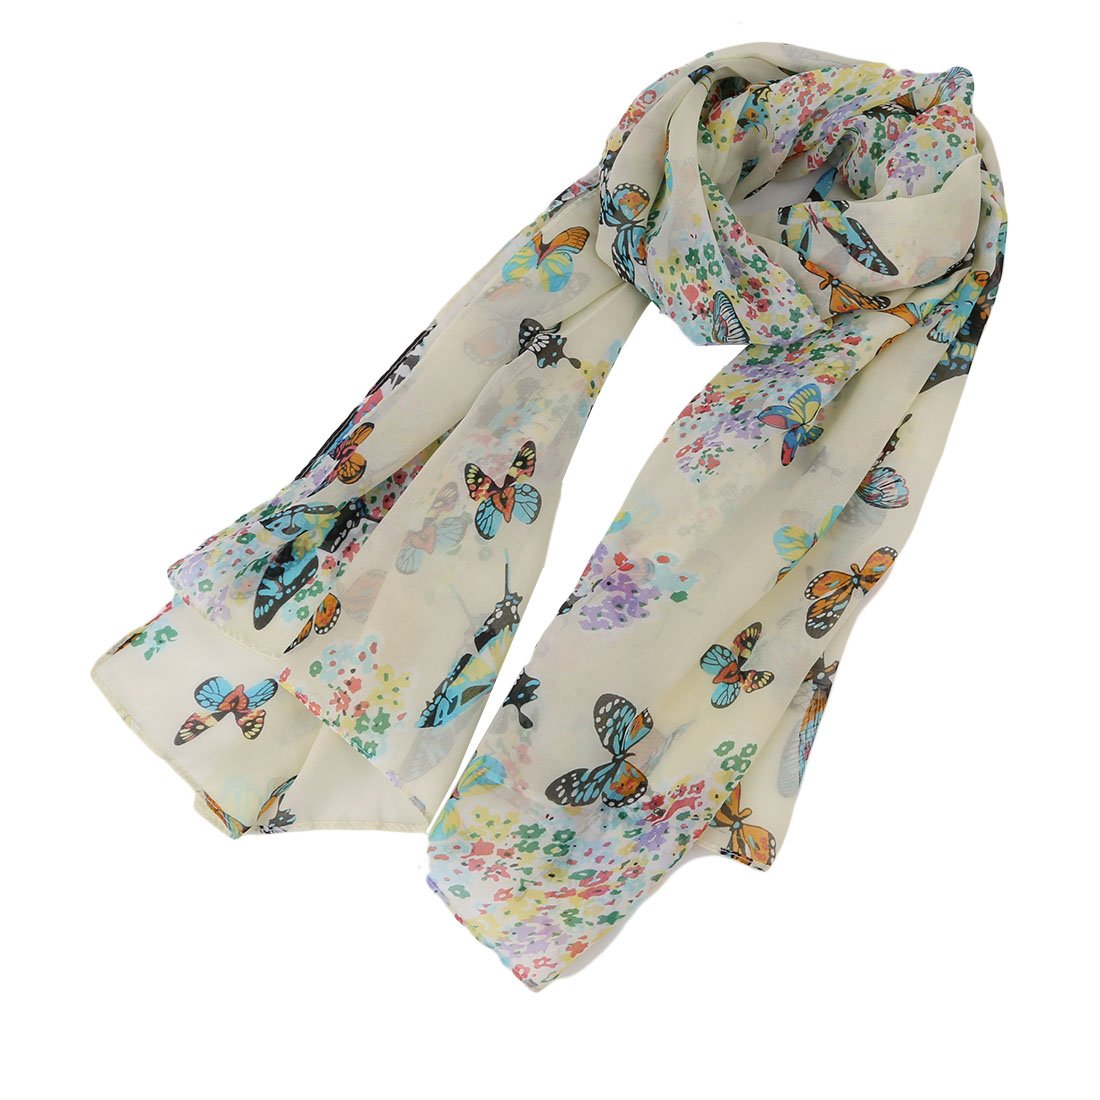 EJY Women Lady Chiffon Butterfly Print Scarf Neck Shawl Scarf Soft Scarves Wrap Stole 88_Store